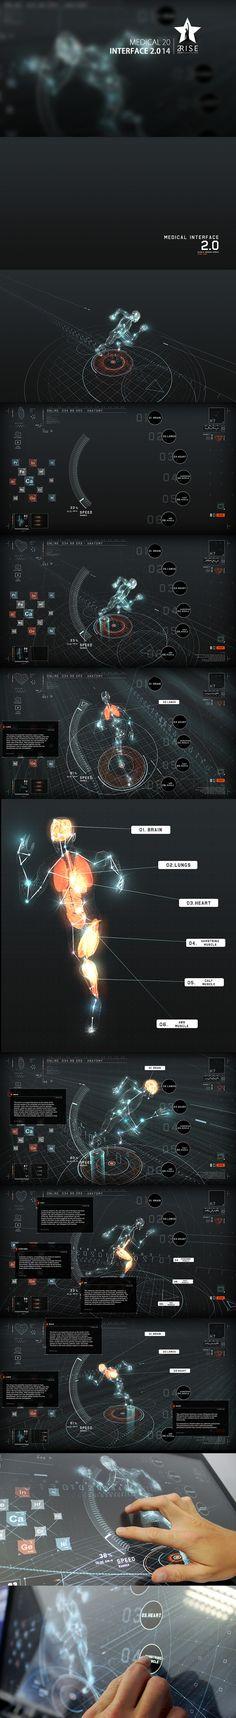 MEDICAL INTERFACE 2.0 by Jedi88.deviantart.com on @deviantART